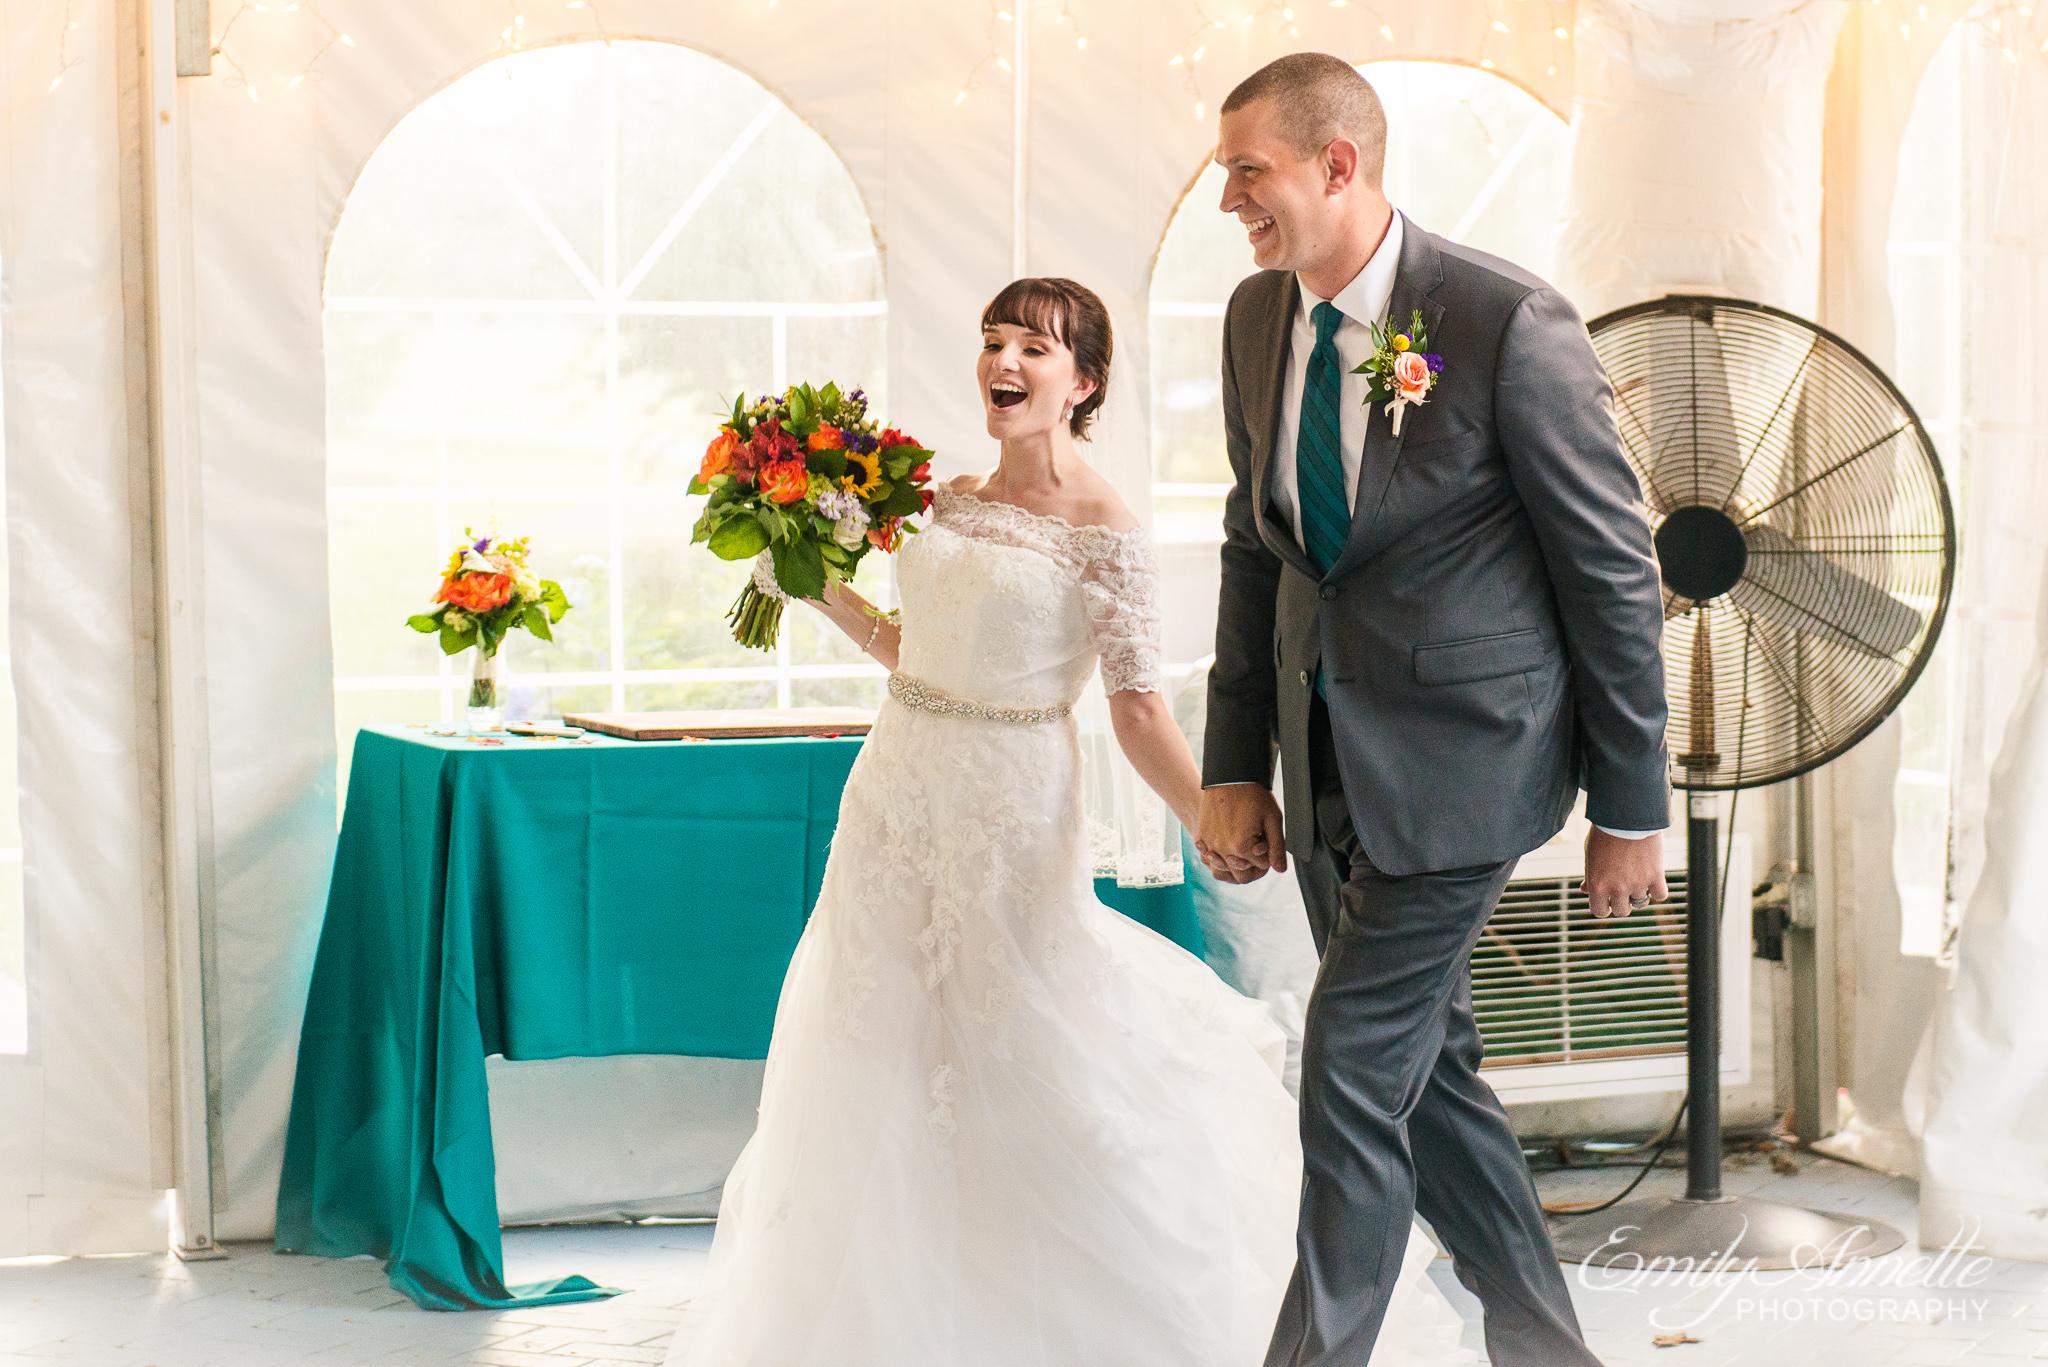 A bride and groom joyfully enter their country wedding reception at Amber Grove near Richmond, Virginia